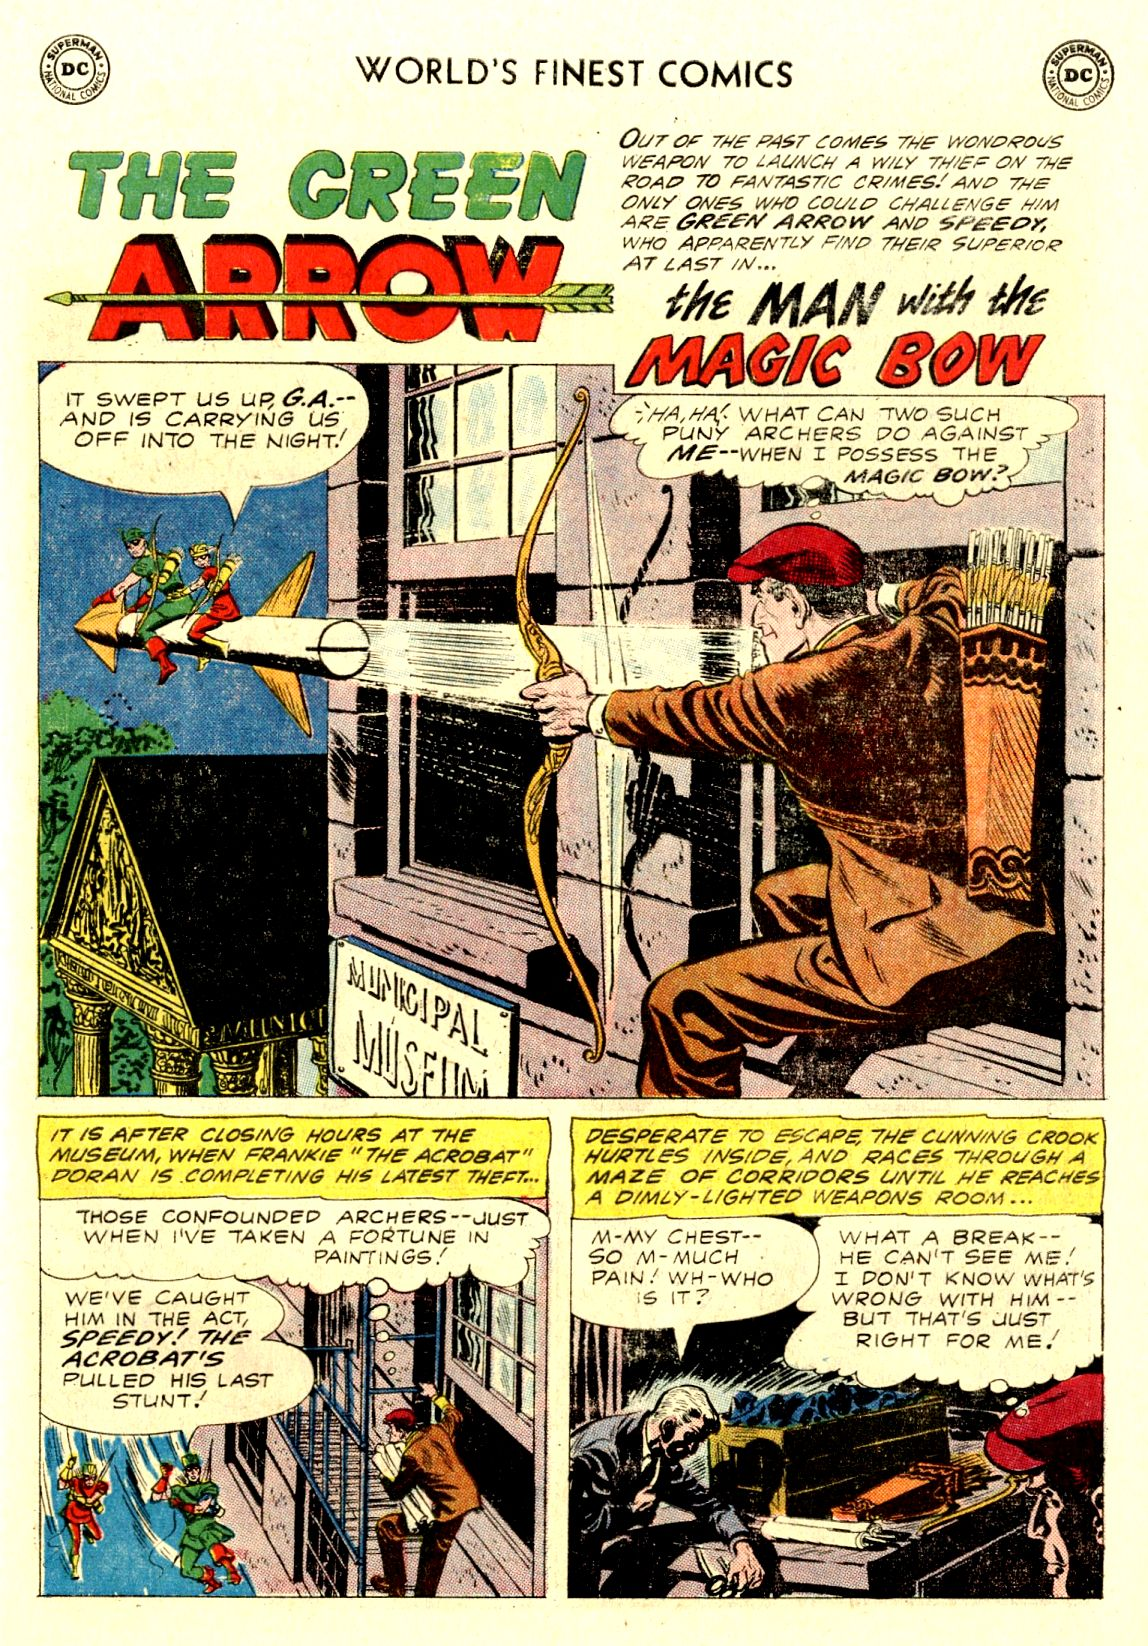 Read online World's Finest Comics comic -  Issue #119 - 27